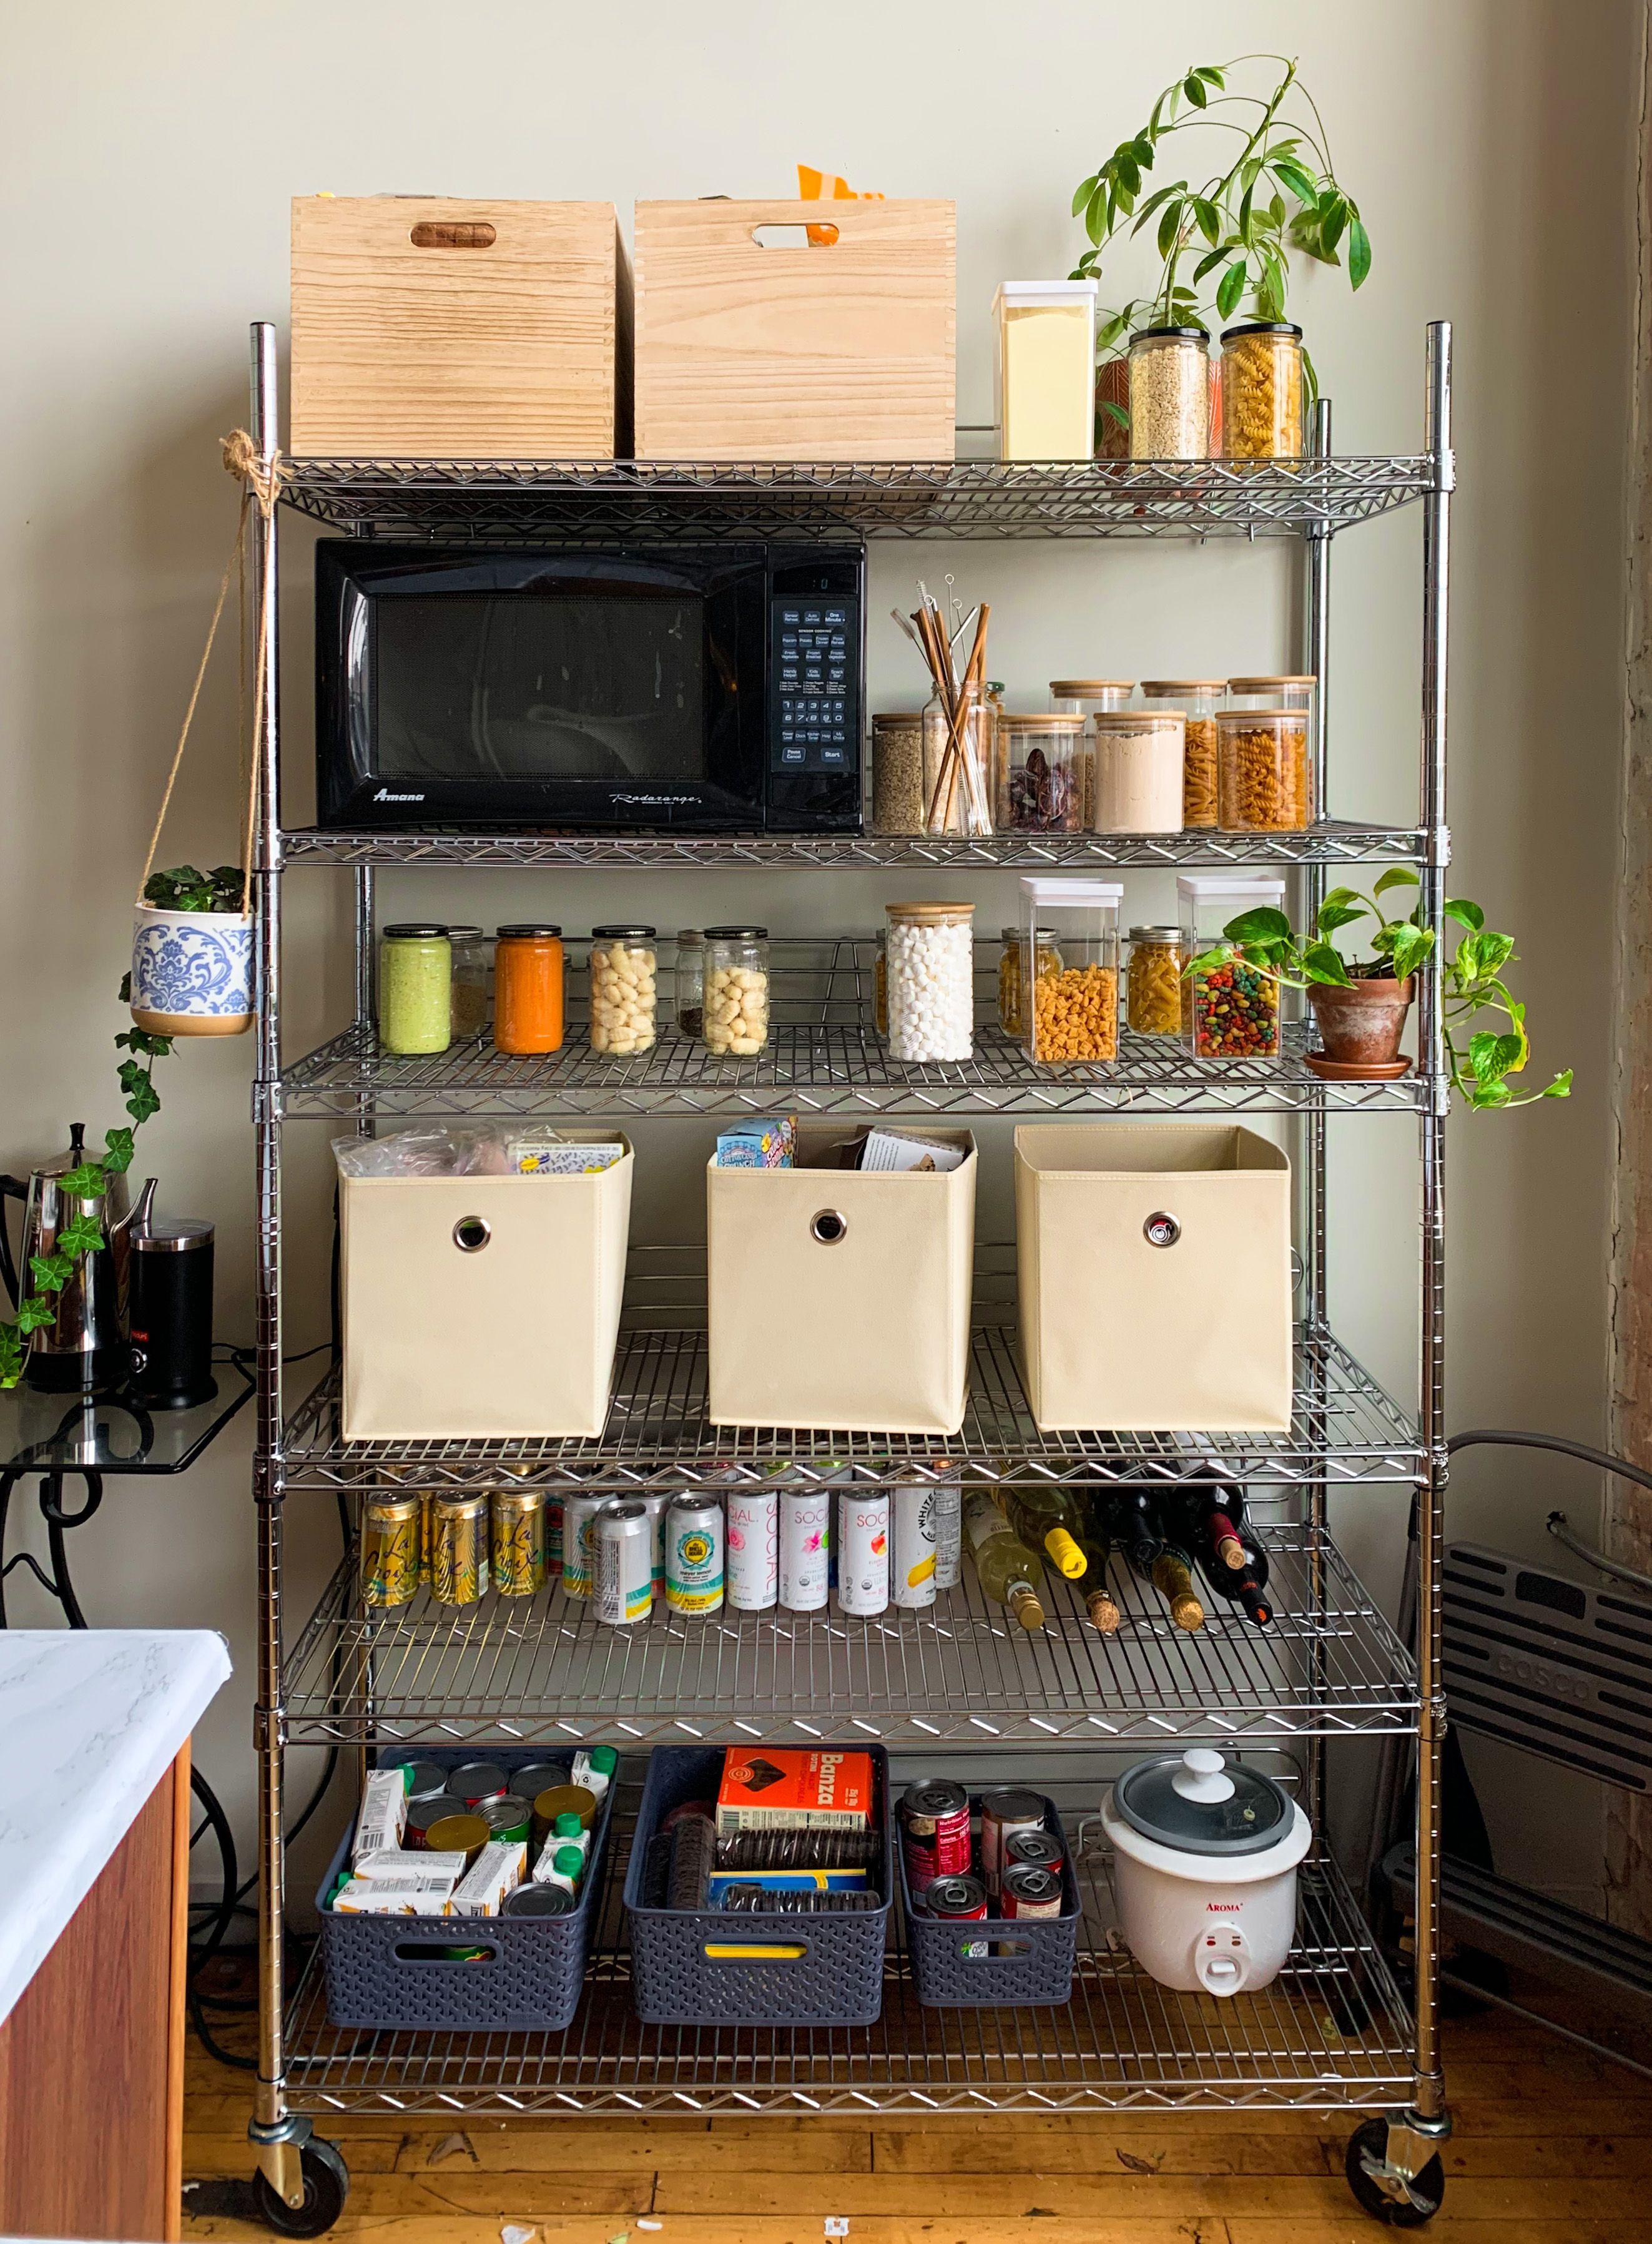 DIY KITCHEN MAKEOVER ON A BUDGET | Design Ideas, Renter Friendly, College Apartment